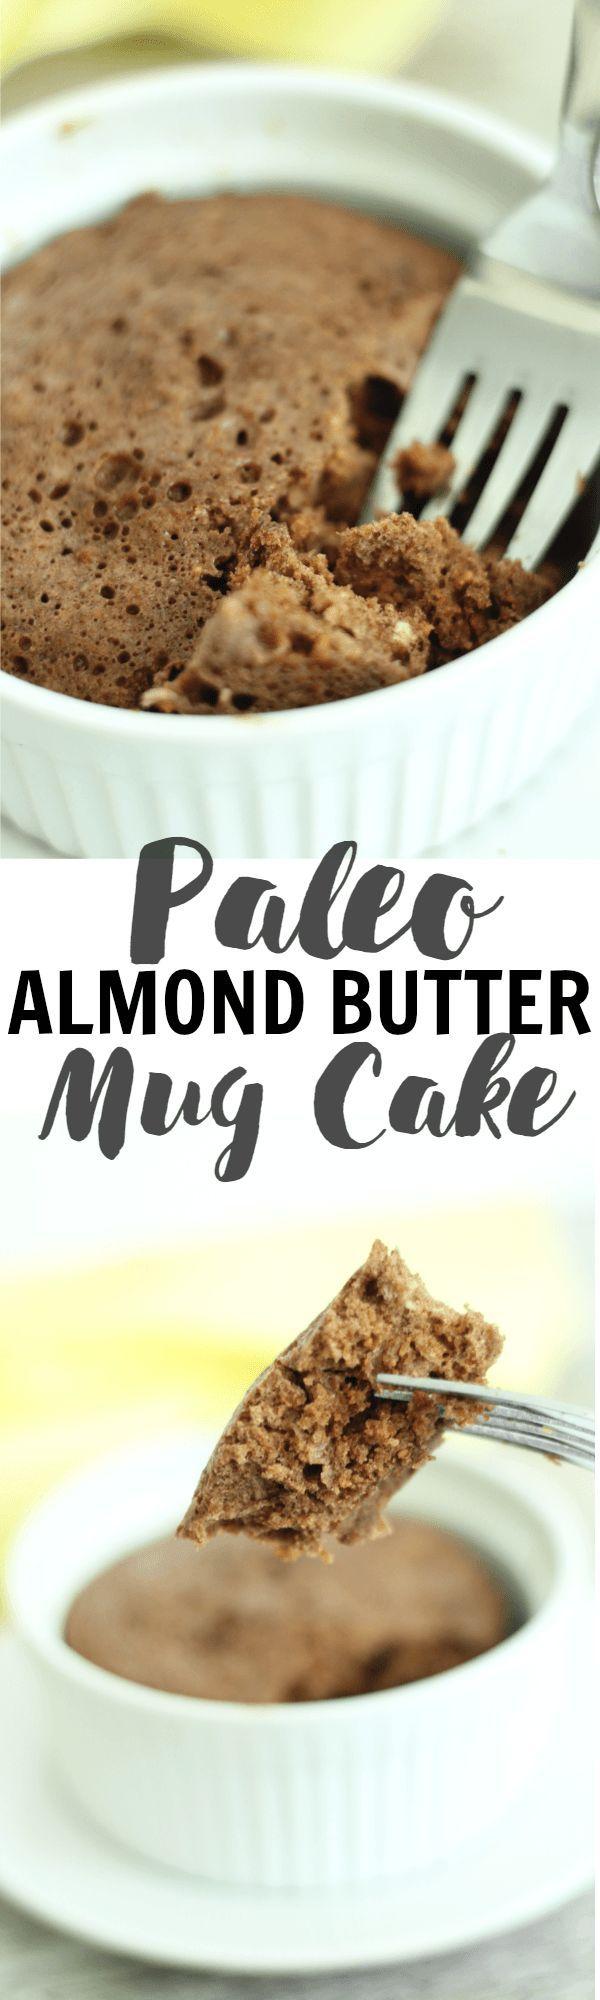 Paleo Almond Butter Mug Cake | Dairy Free Gluten Free Flourless Paleo | Lean, Clean, & Brie